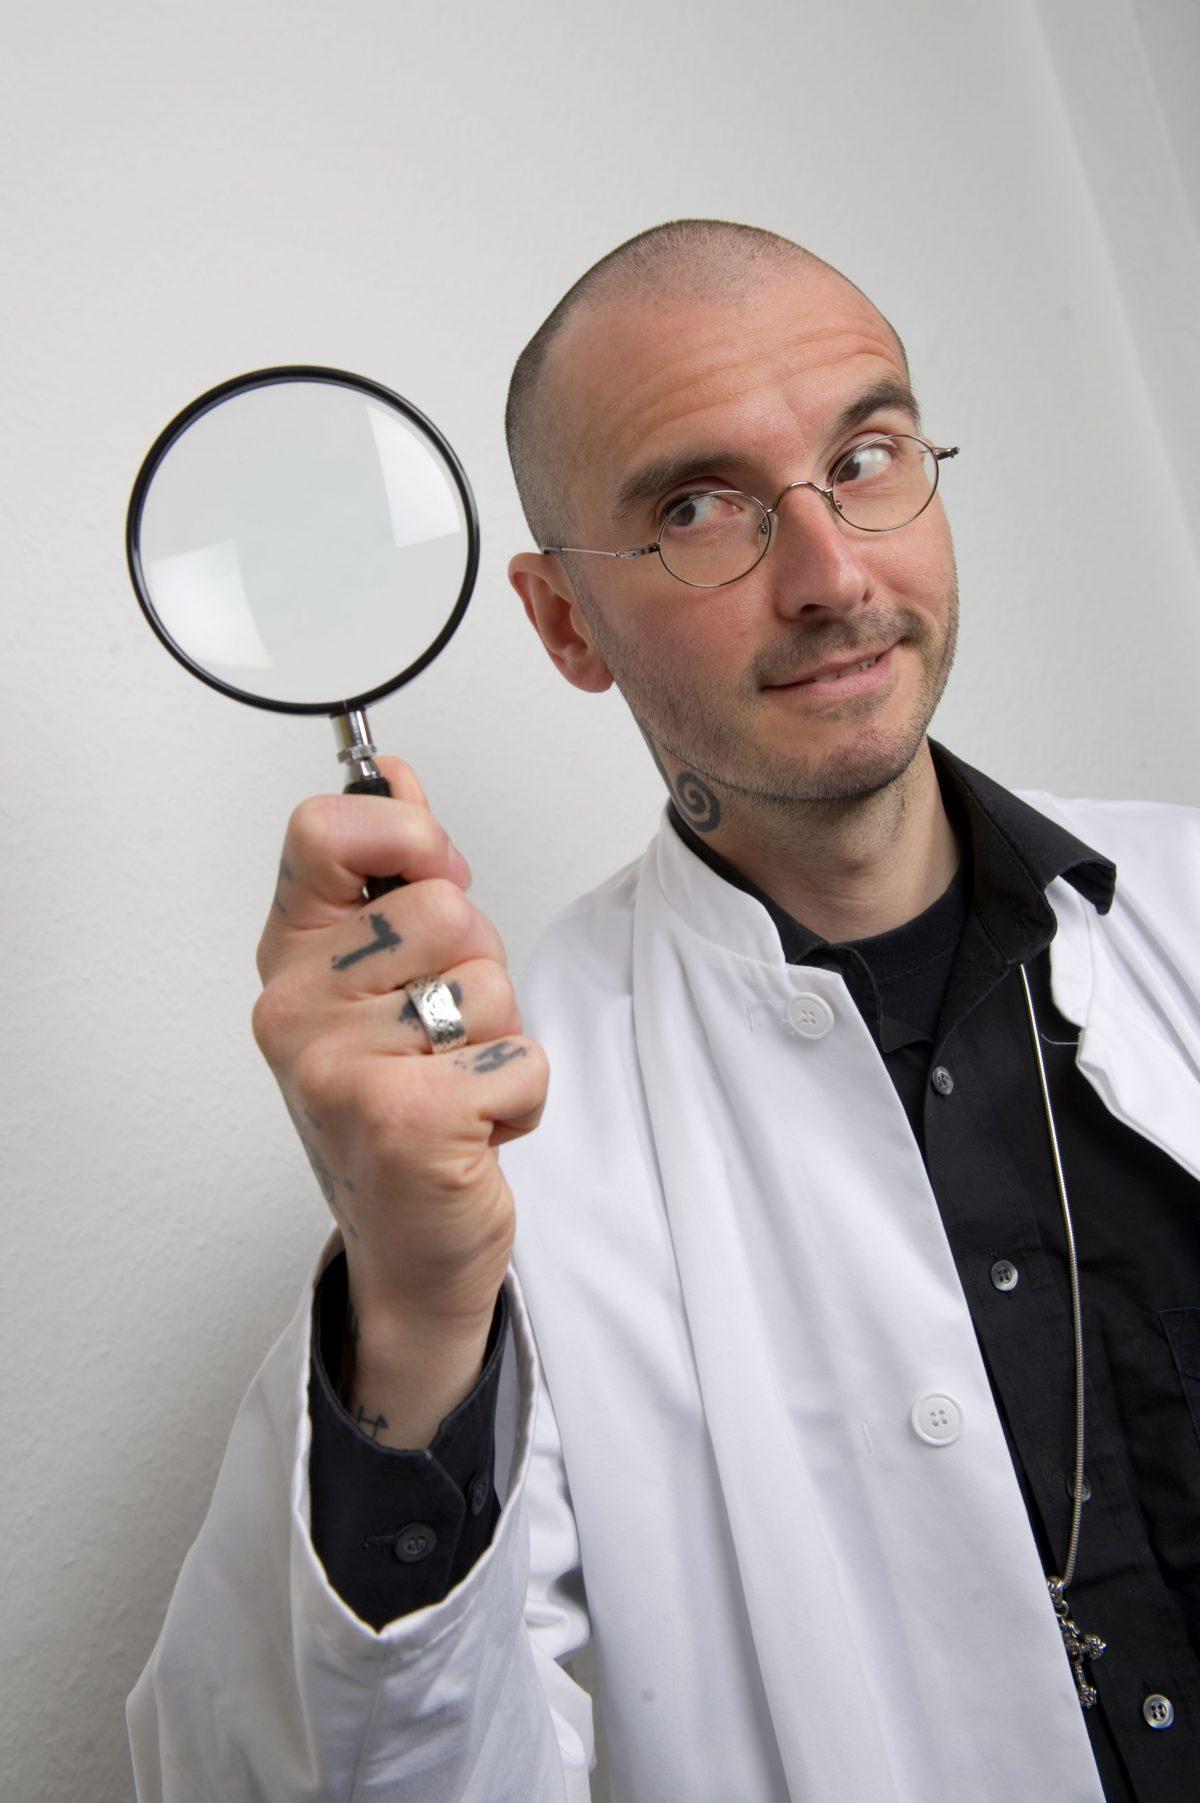 Dr Mark Beneke